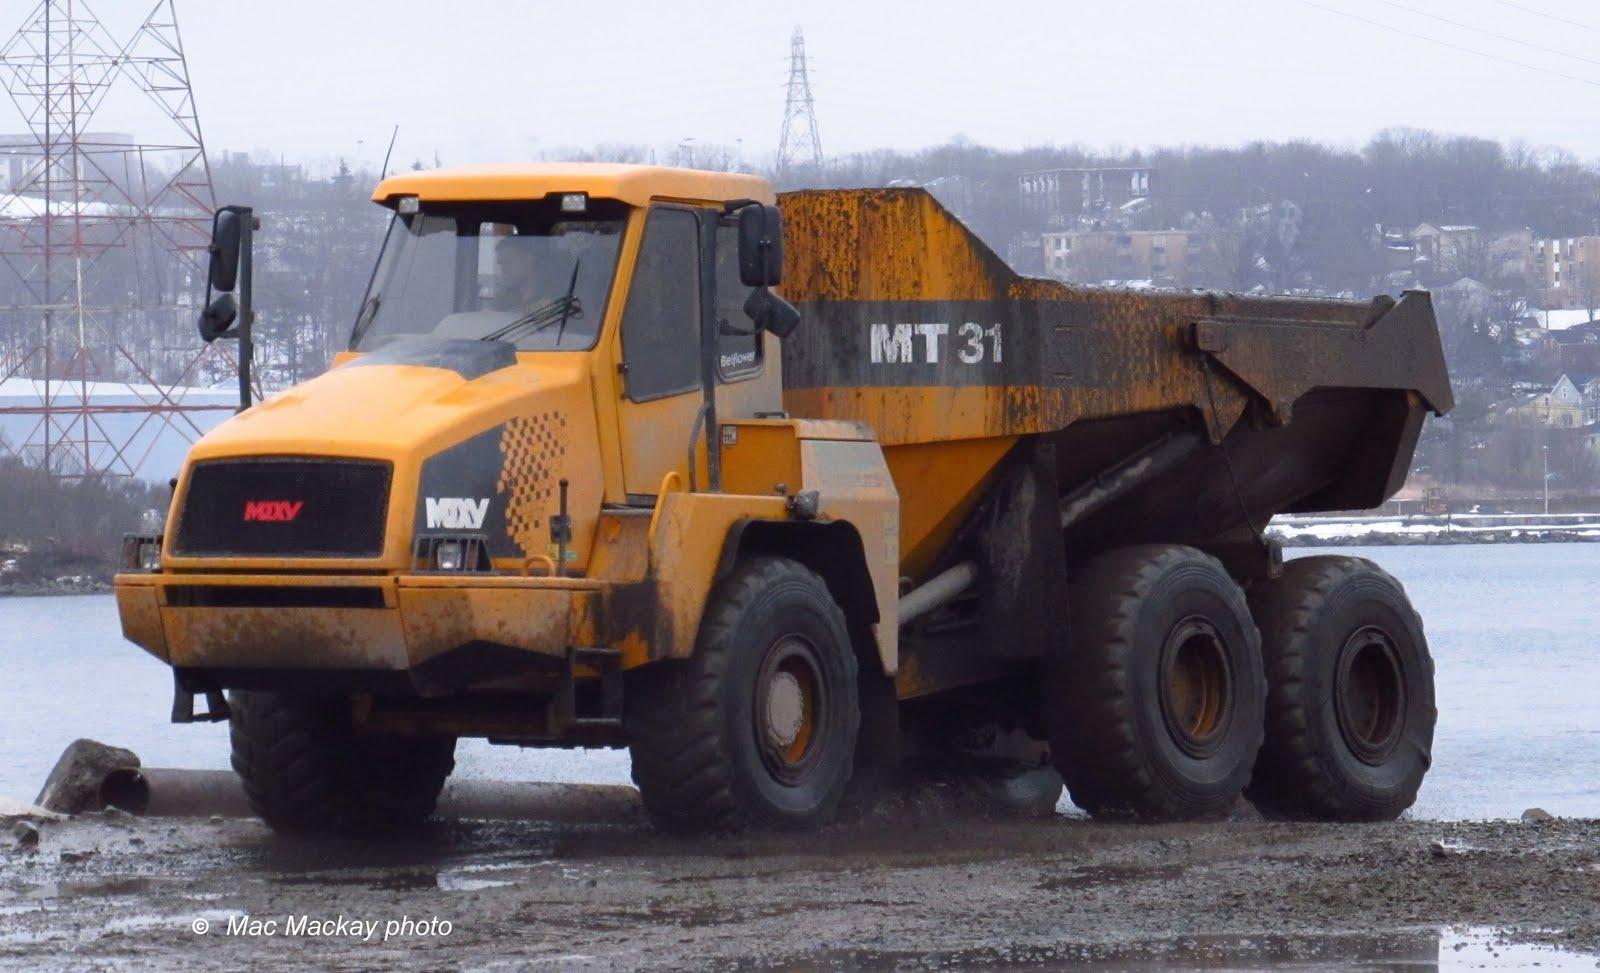 moxy  dumper tipper company Moxy%20MT31%20truck